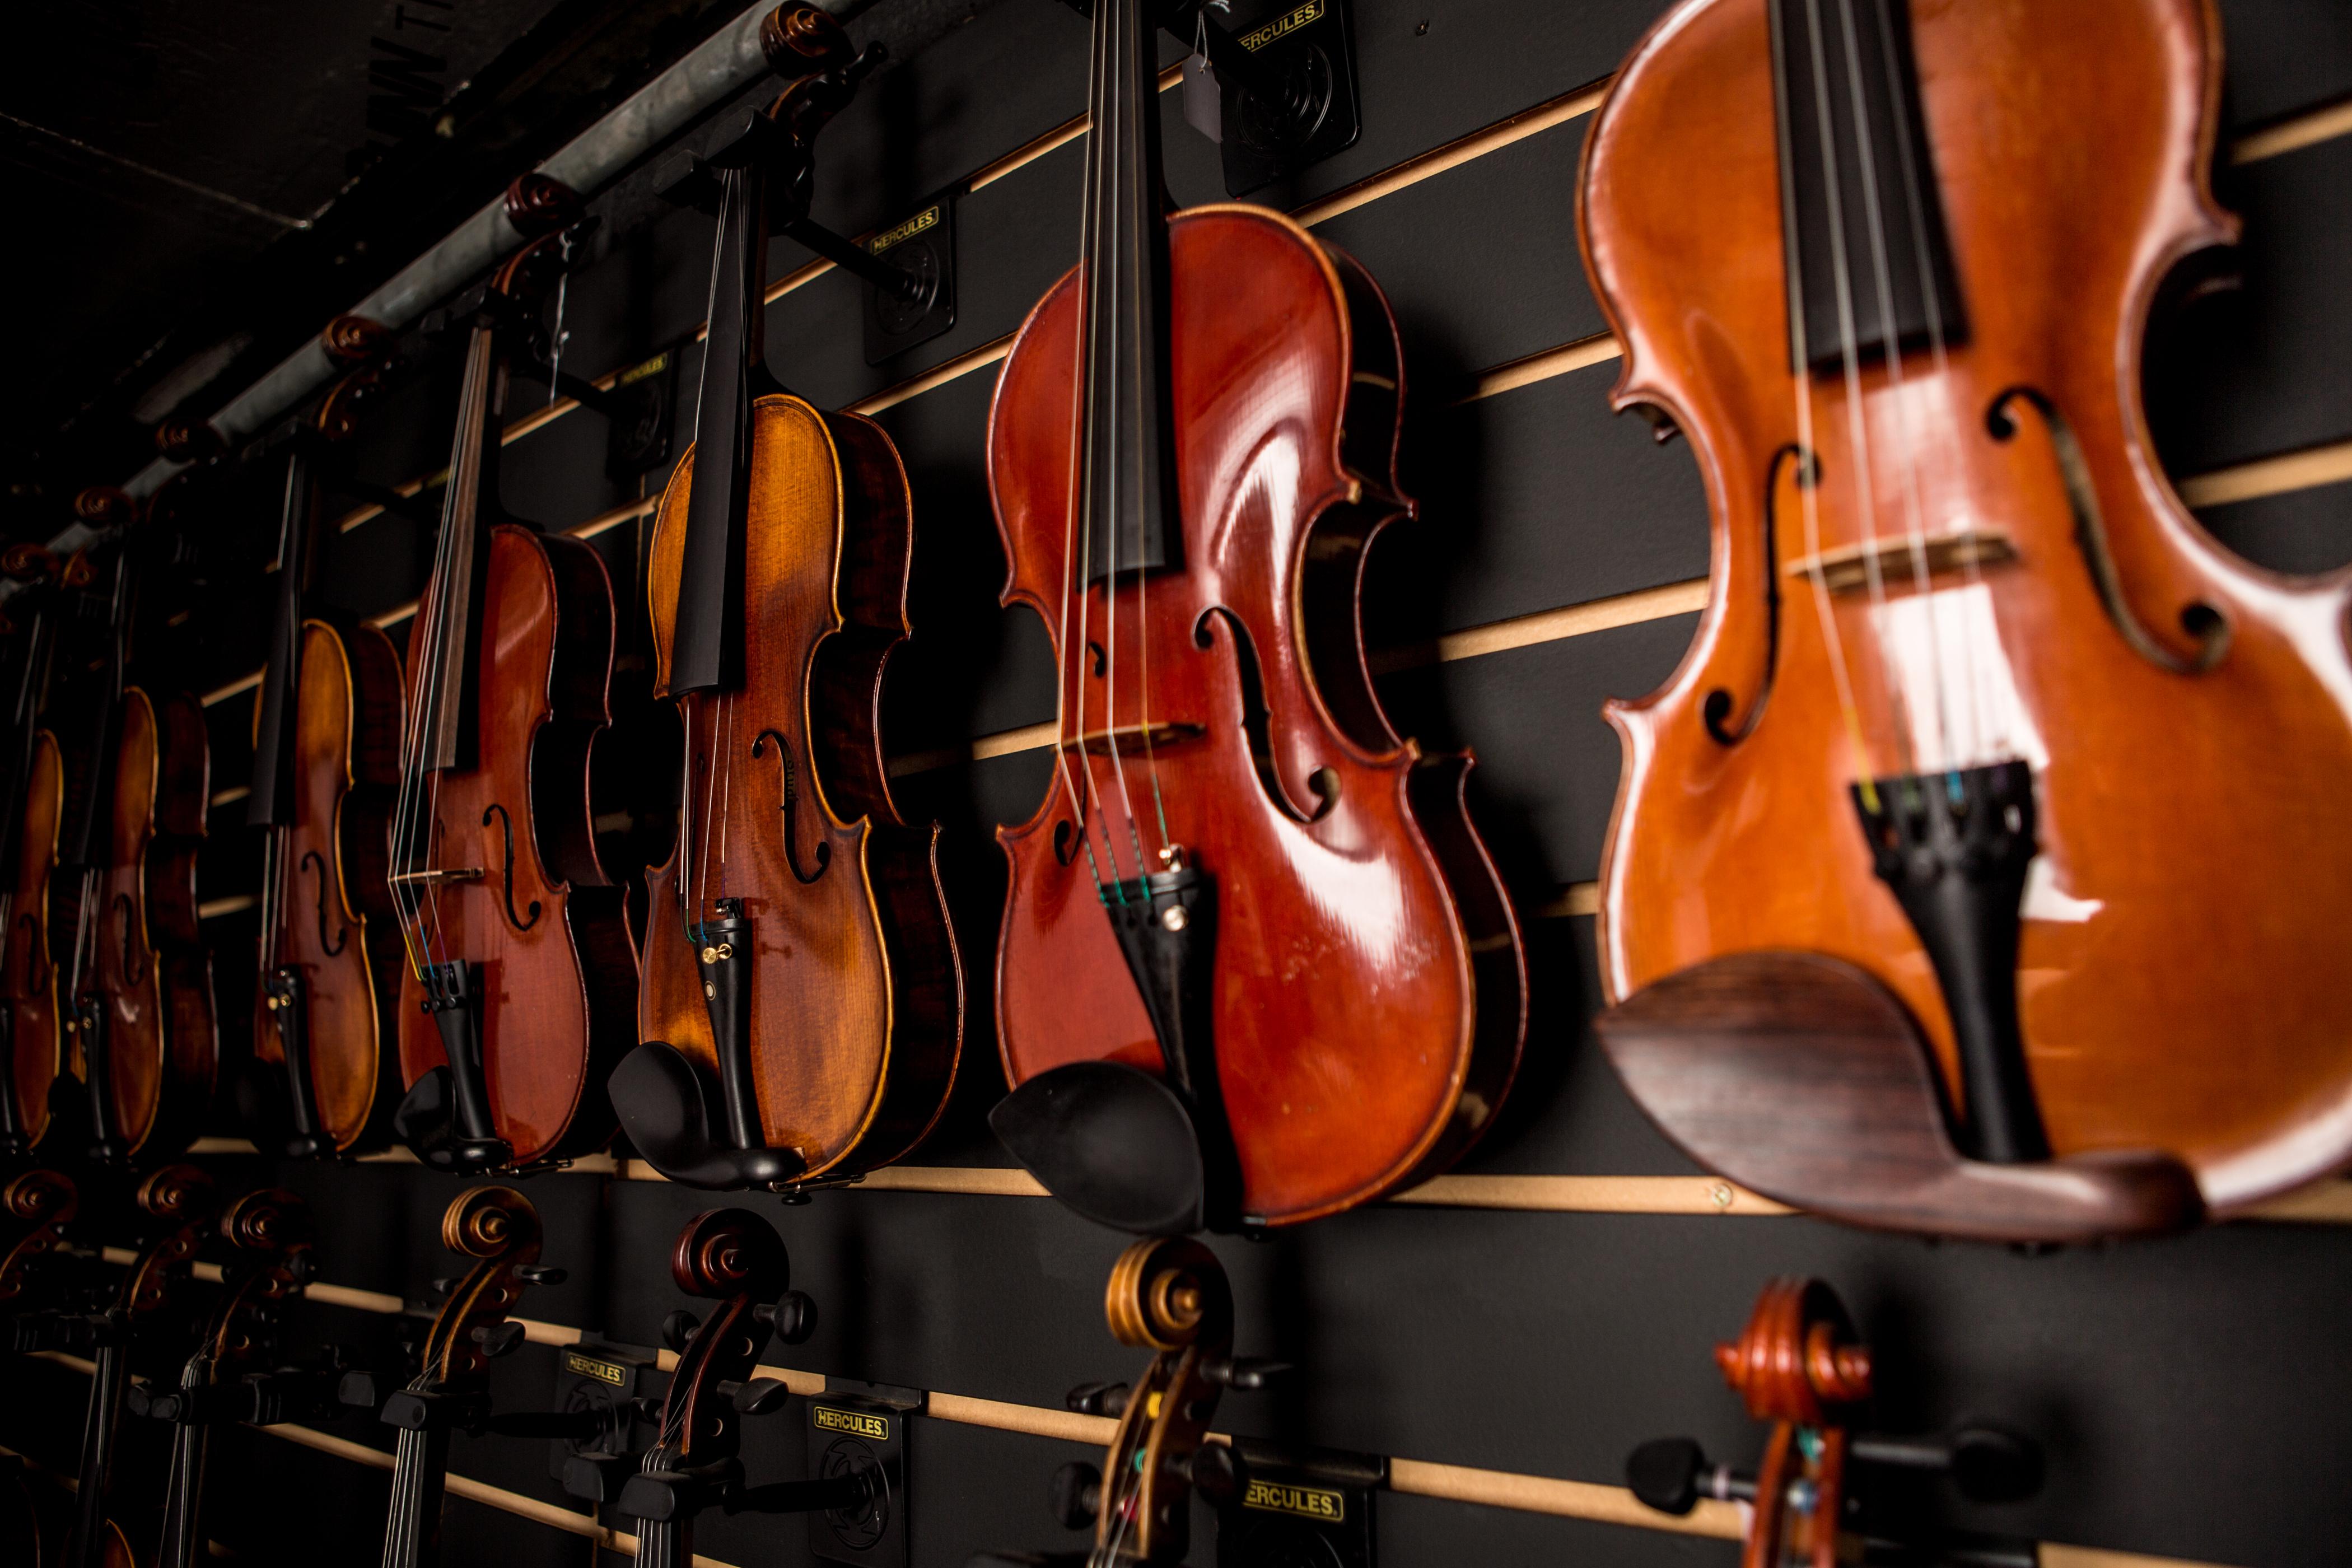 mcneela-instruments-workshop-fiddle-wall.jpg